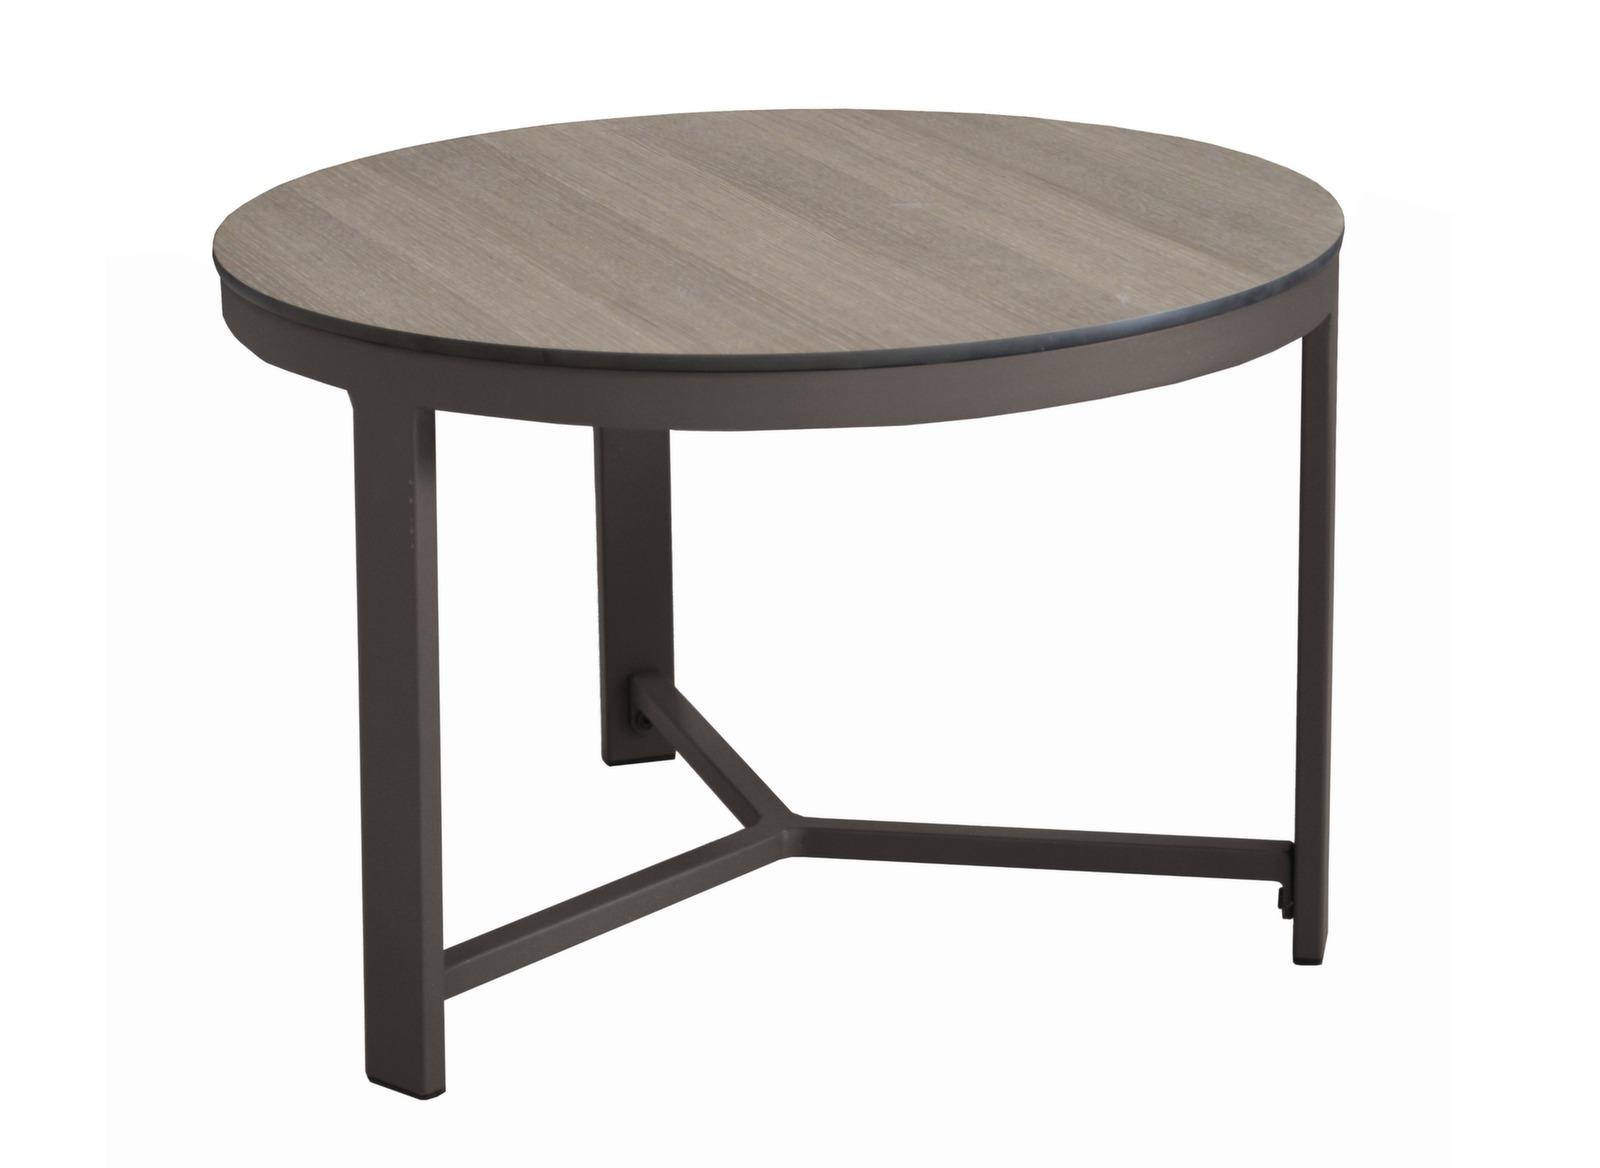 Table basse augusta 60 cm plateau hpl tables basses for Table basse design 60 cm